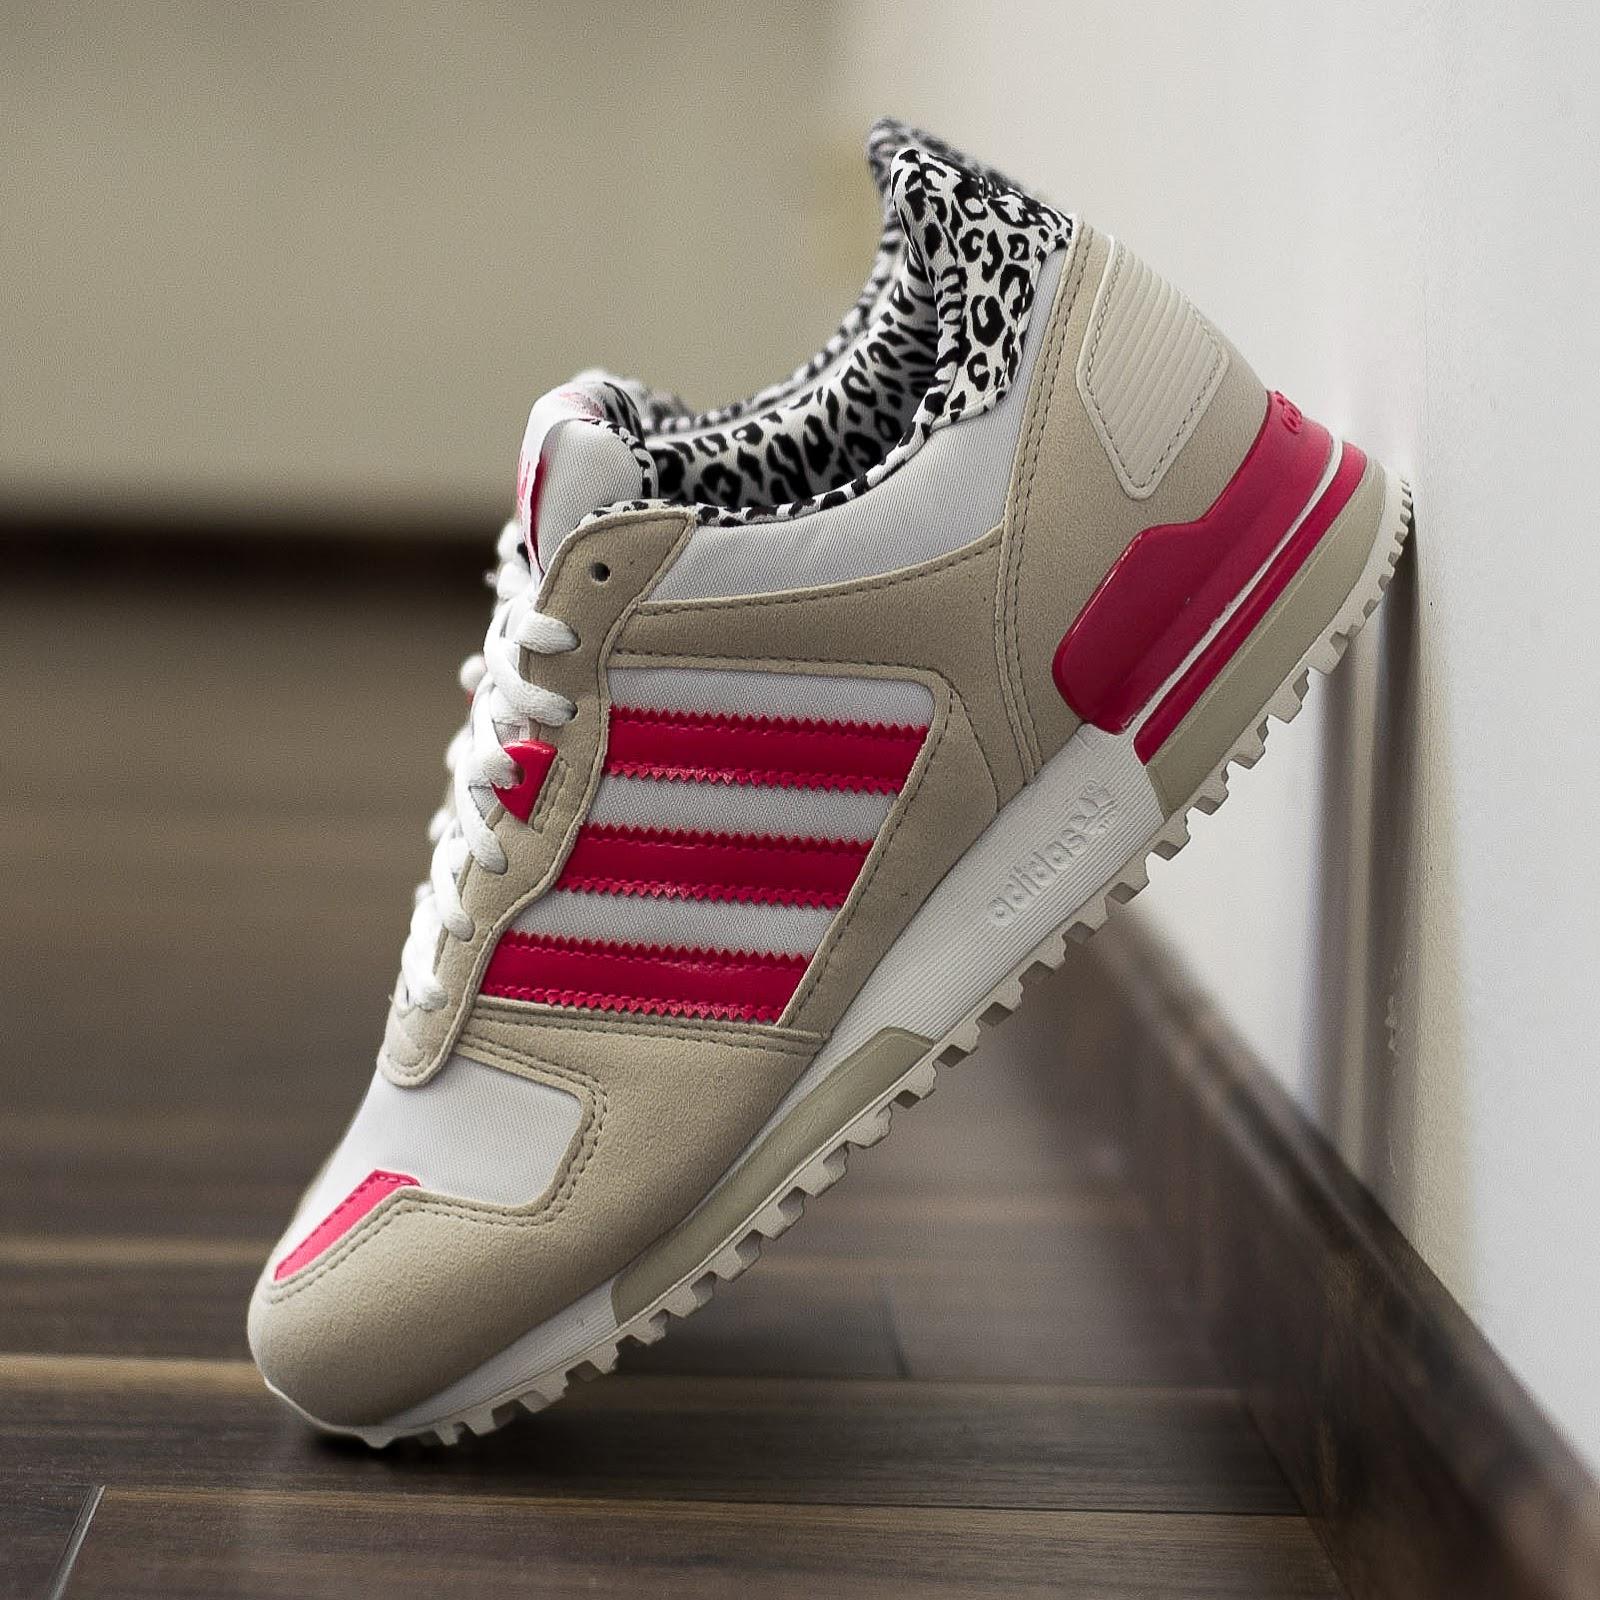 Adidas 3 Streifen pisocompartido madrid.es